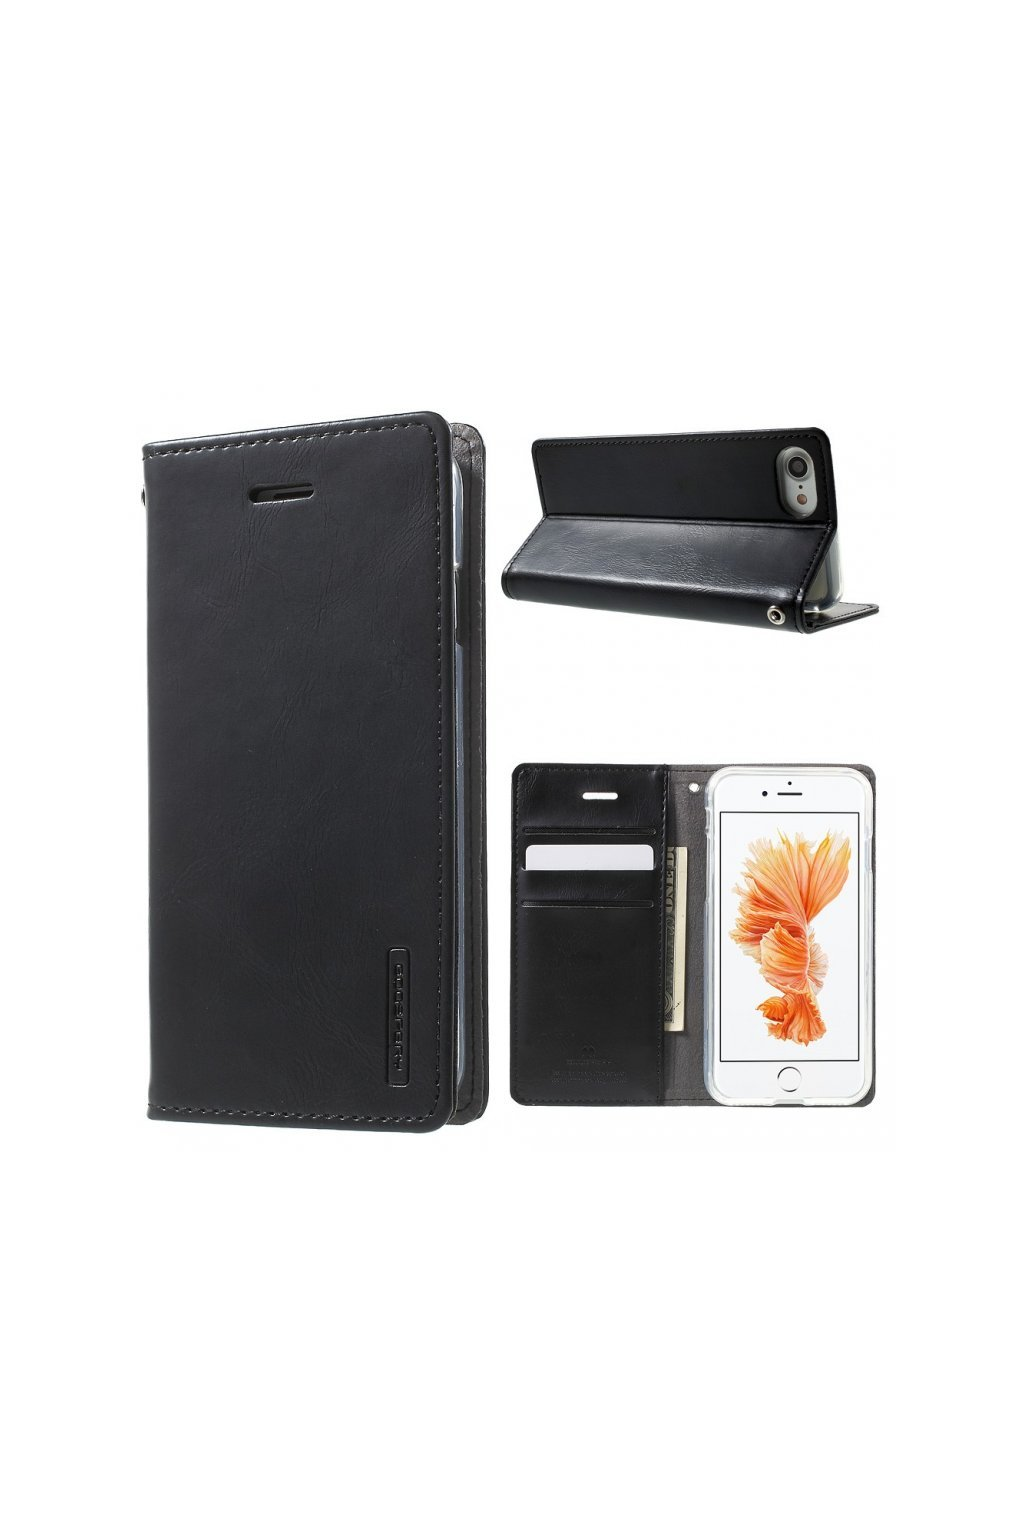 7310 pouzdro kryt pro iphone 7 8 mercury bluemoon flip black